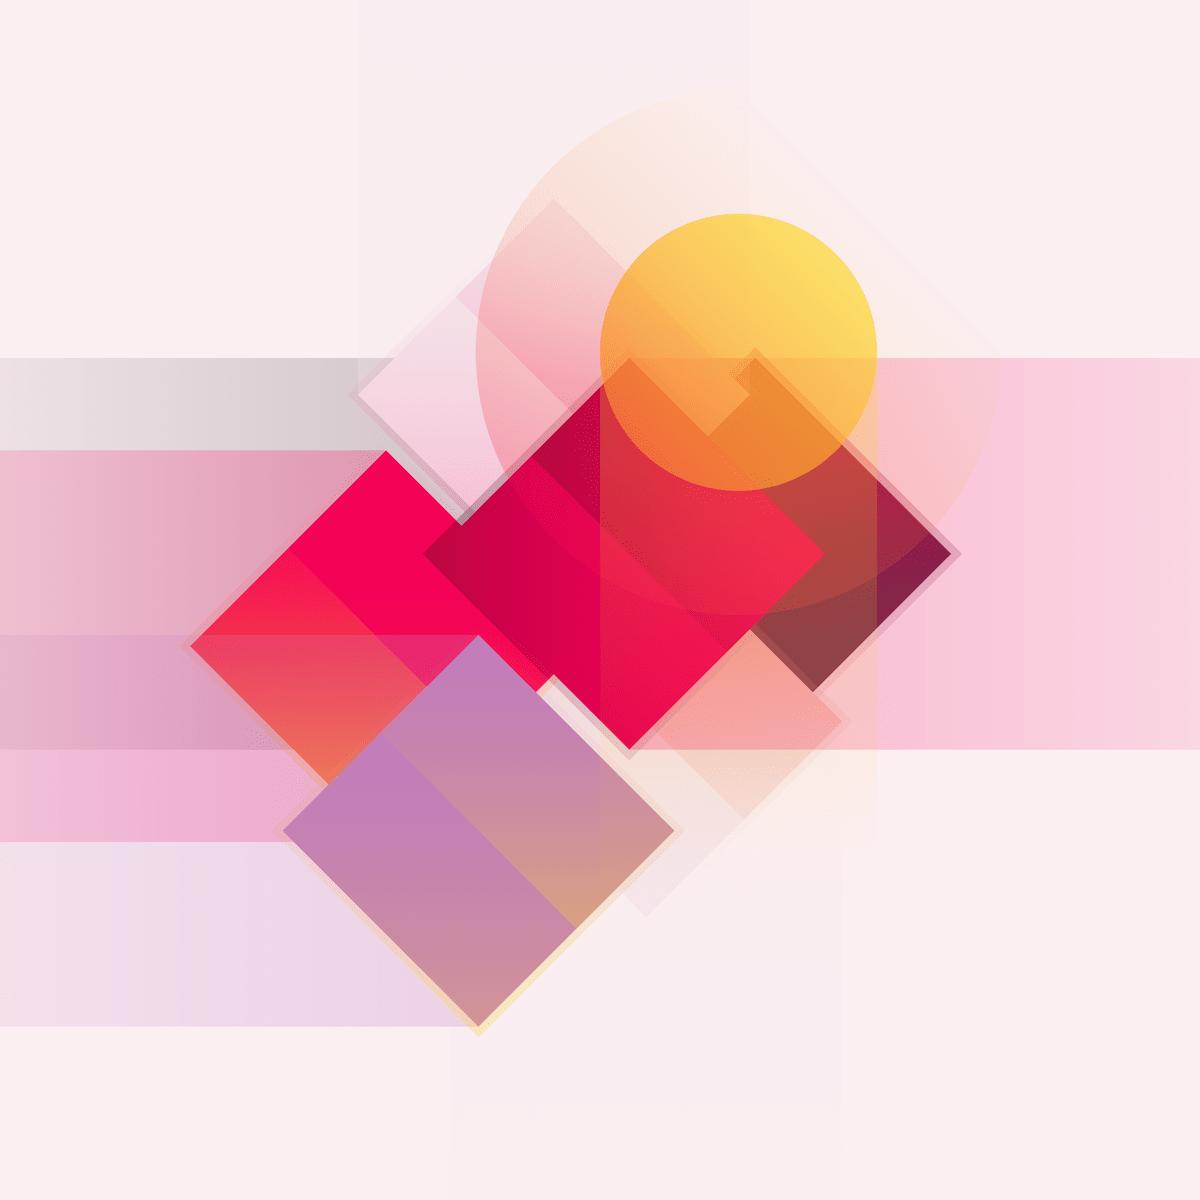 Wanderlust #10295 - Sunrise